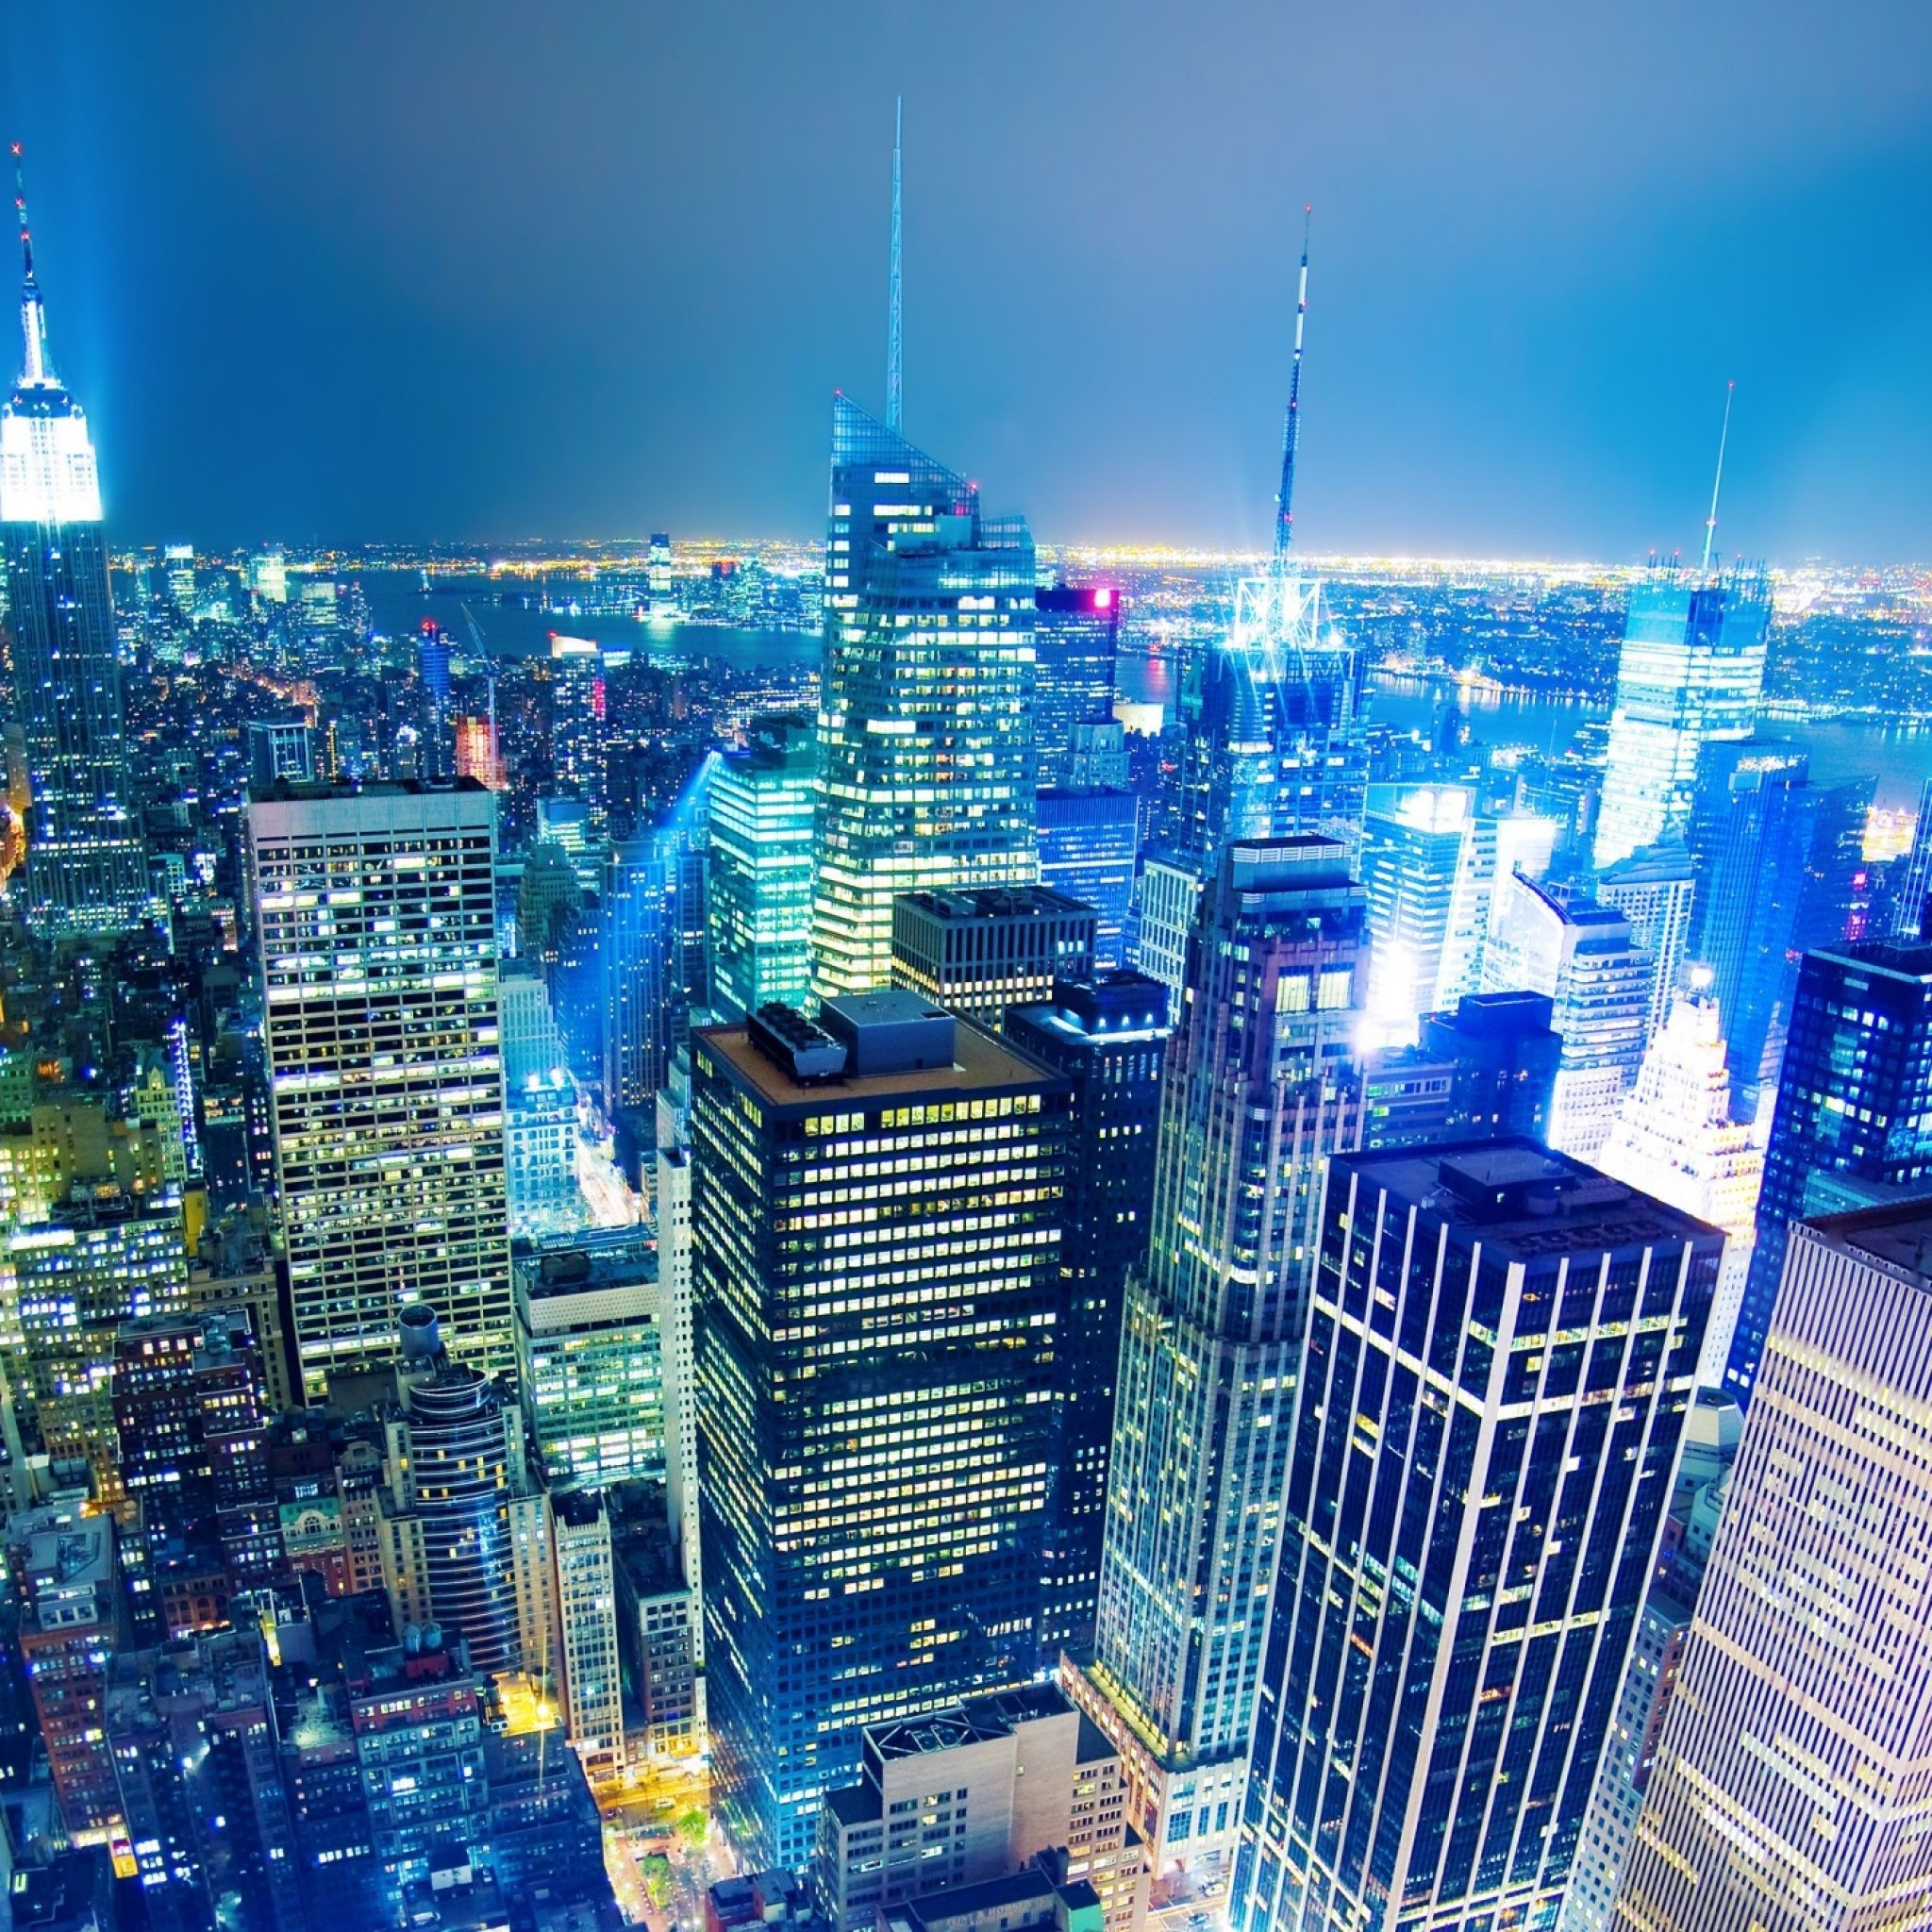 Top of the Rockefeller Center New York iPad 3,4 & Air Wallpaper .